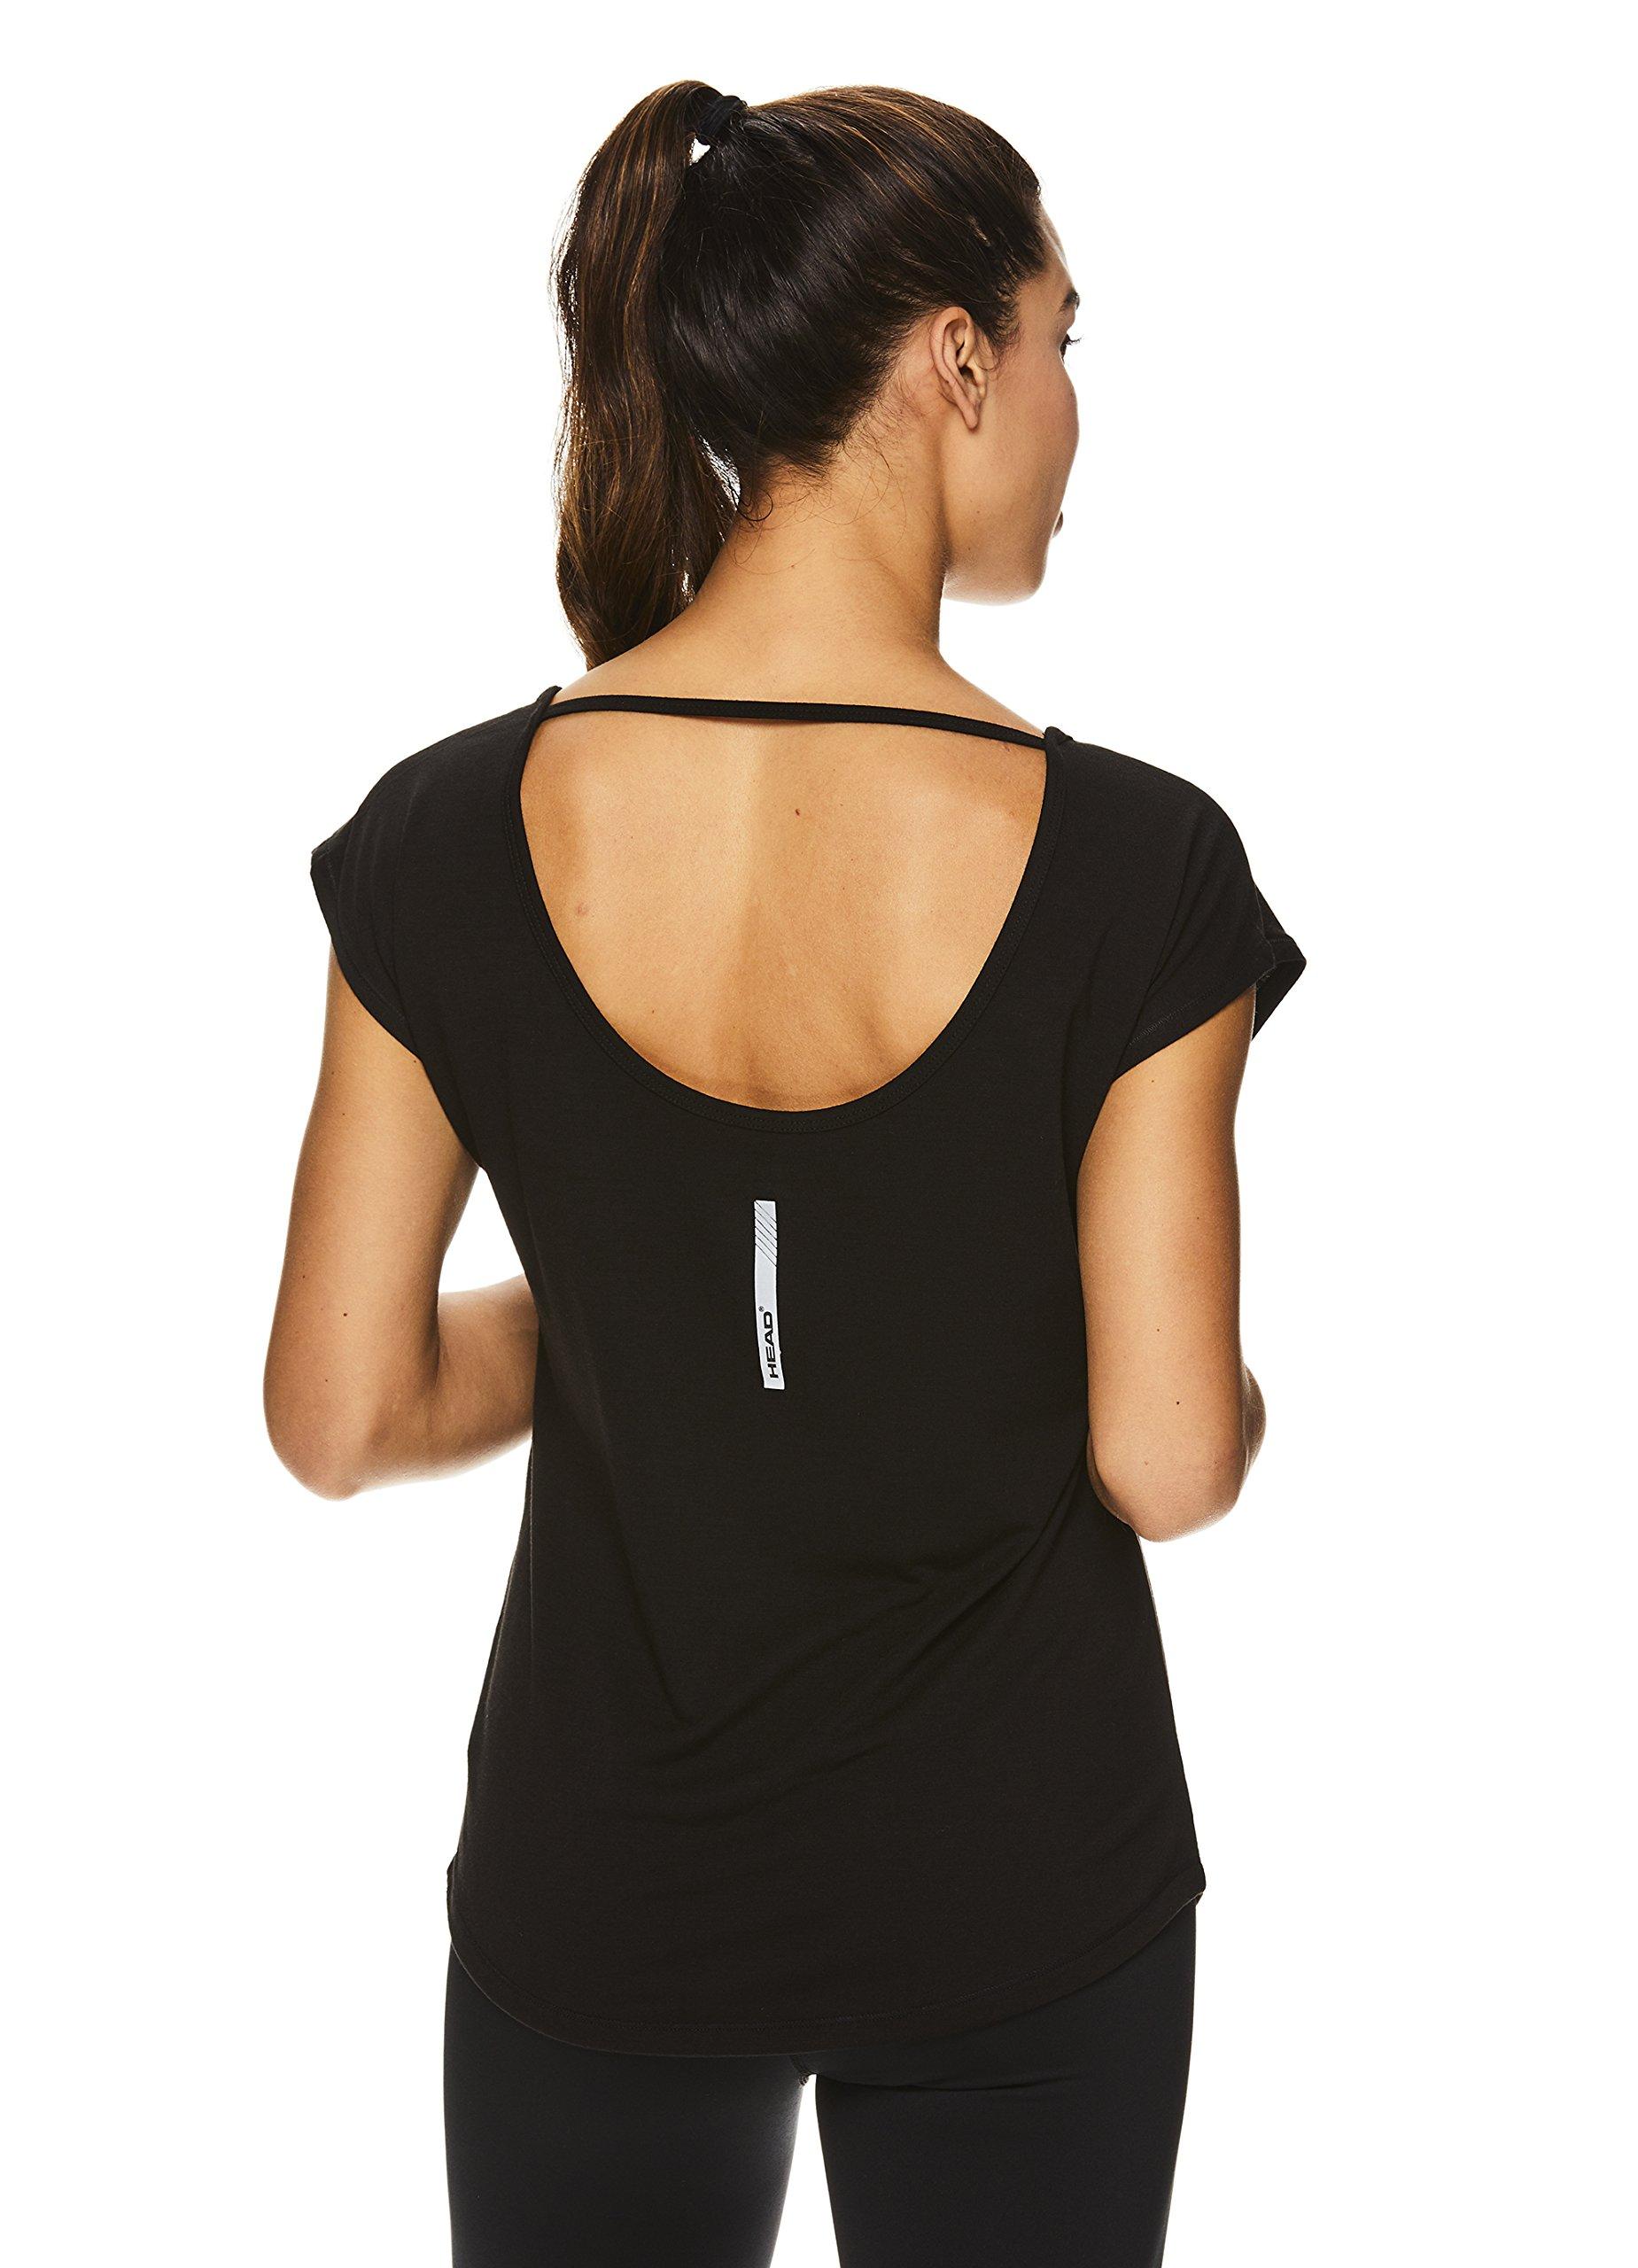 HEAD Women's Open Back Short Sleeve Workout T Shirt - Performance Scoop Neck Activewear Top - Black Power, Large